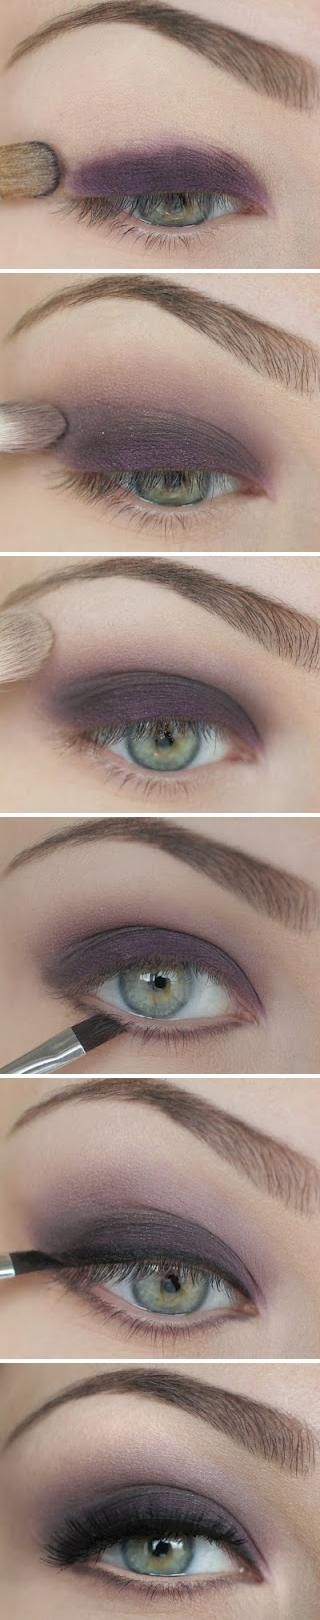 Smokey purple eyeshadow.Purple Eyeshadows, Eye Shadows, Smoky Eye, Pretty Makeup, Purple Smokey, Green Eyes, Dark Purple, Smokey Eye, Eye Makeup Tutorials